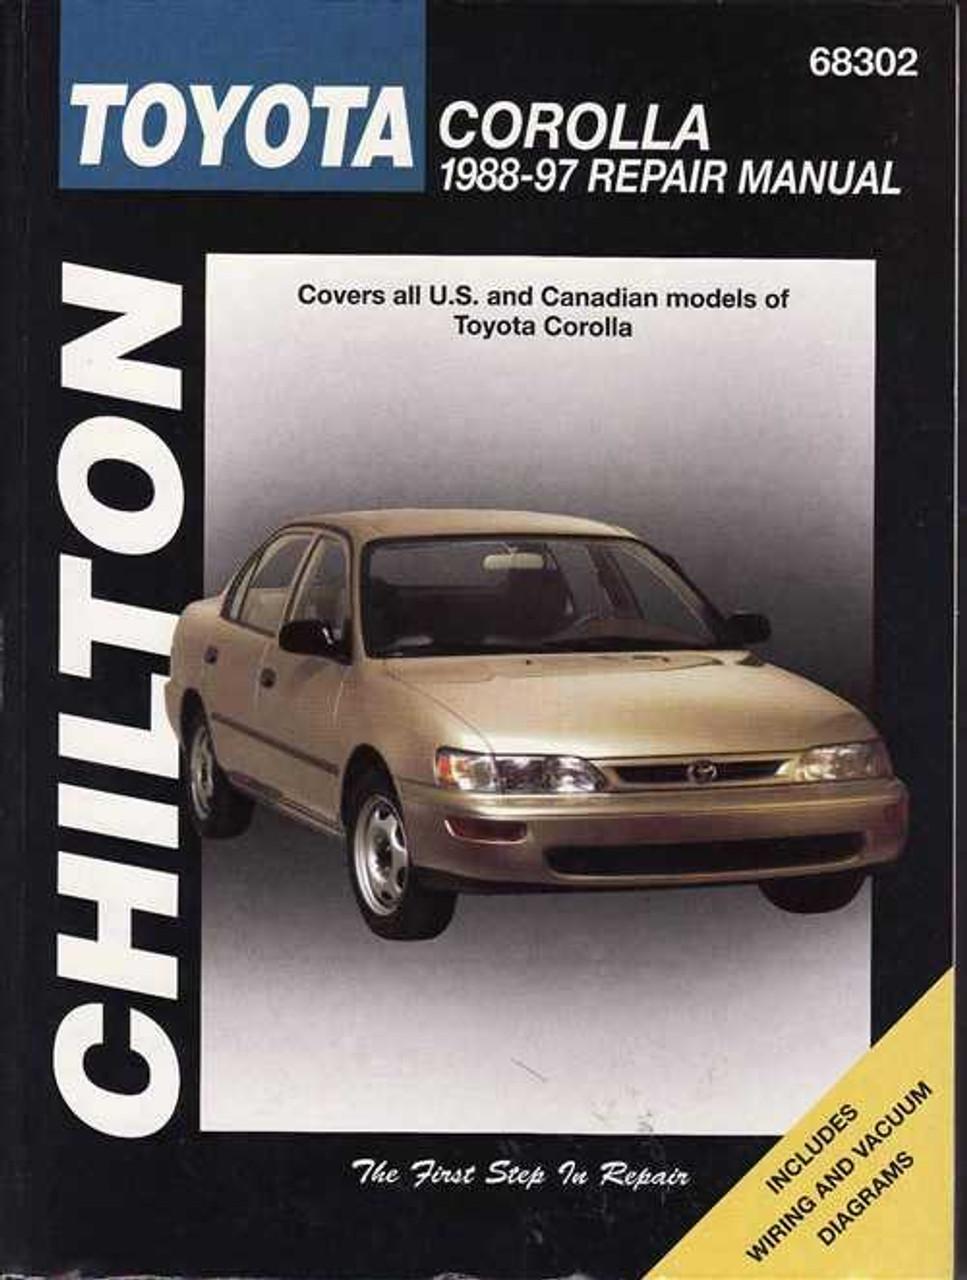 toyota corolla 1988 1997 workshop manual rh automotobookshop com au Toyota Corolla Service Diagrams Toyota Corolla Service Diagrams